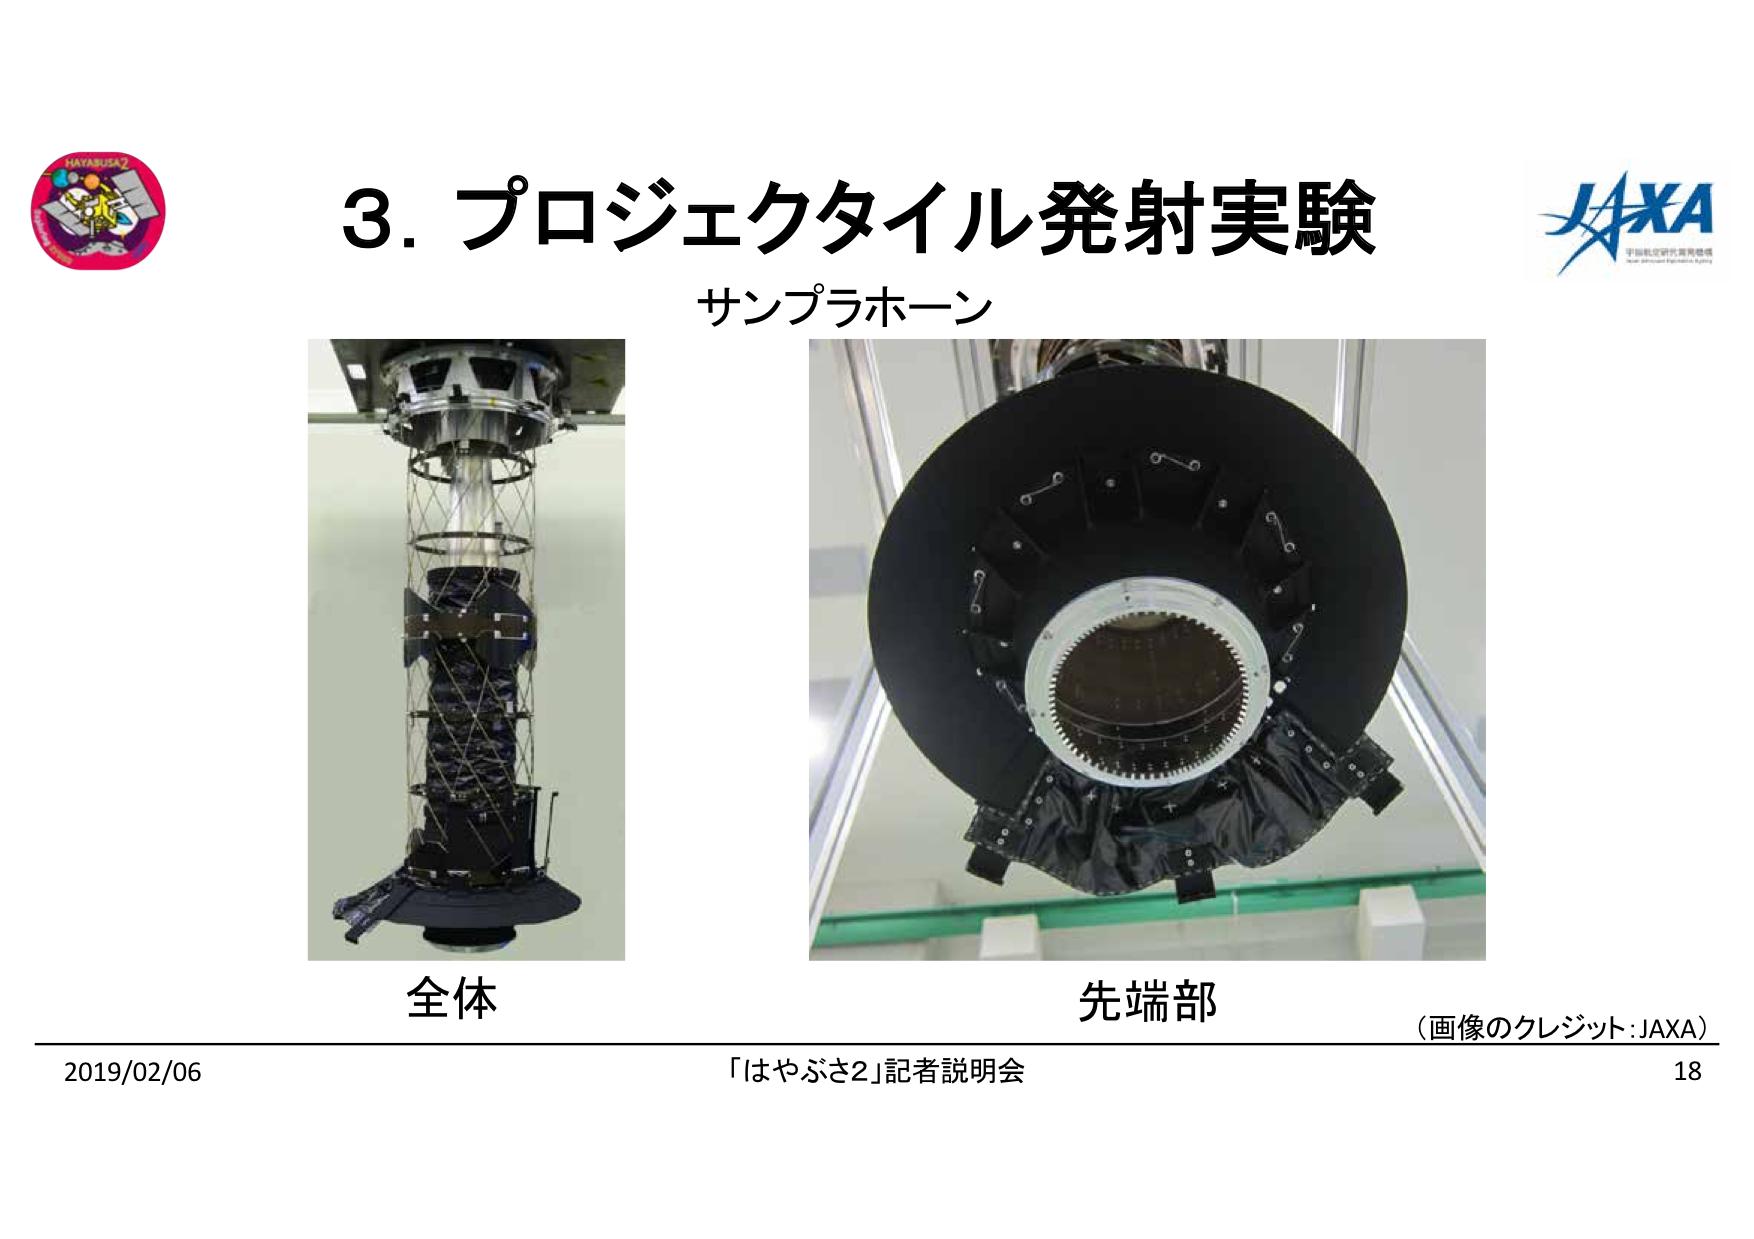 f:id:Imamura:20190204175512p:plain